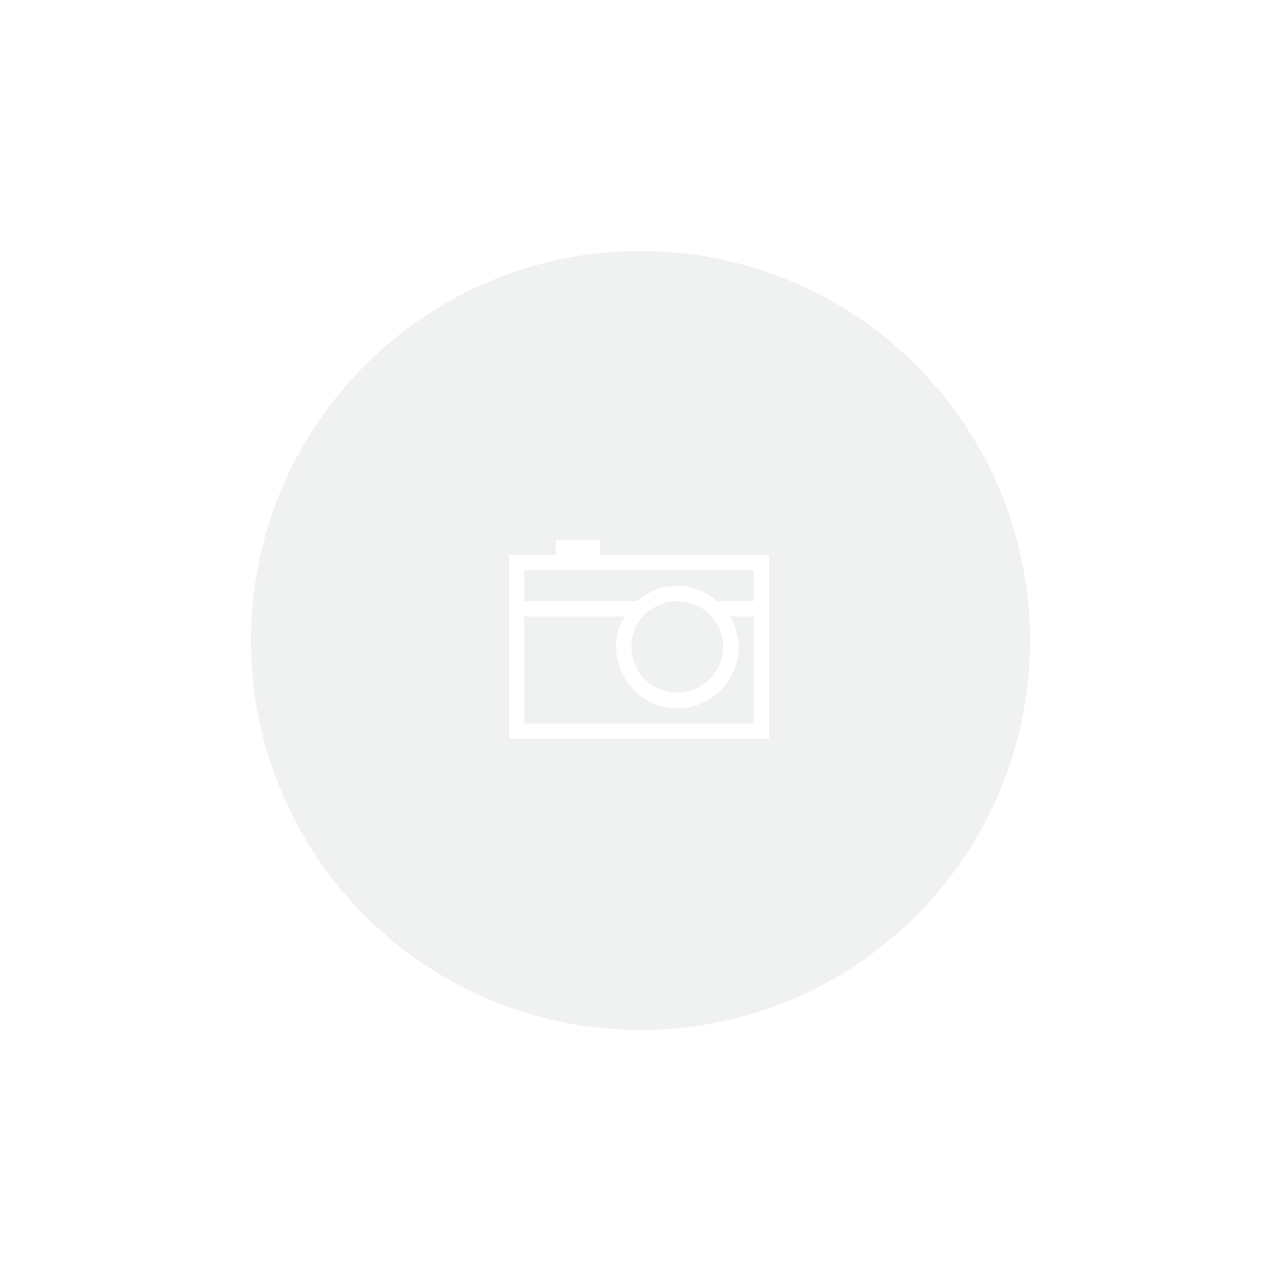 Cobertor Aspen Super King Castanho